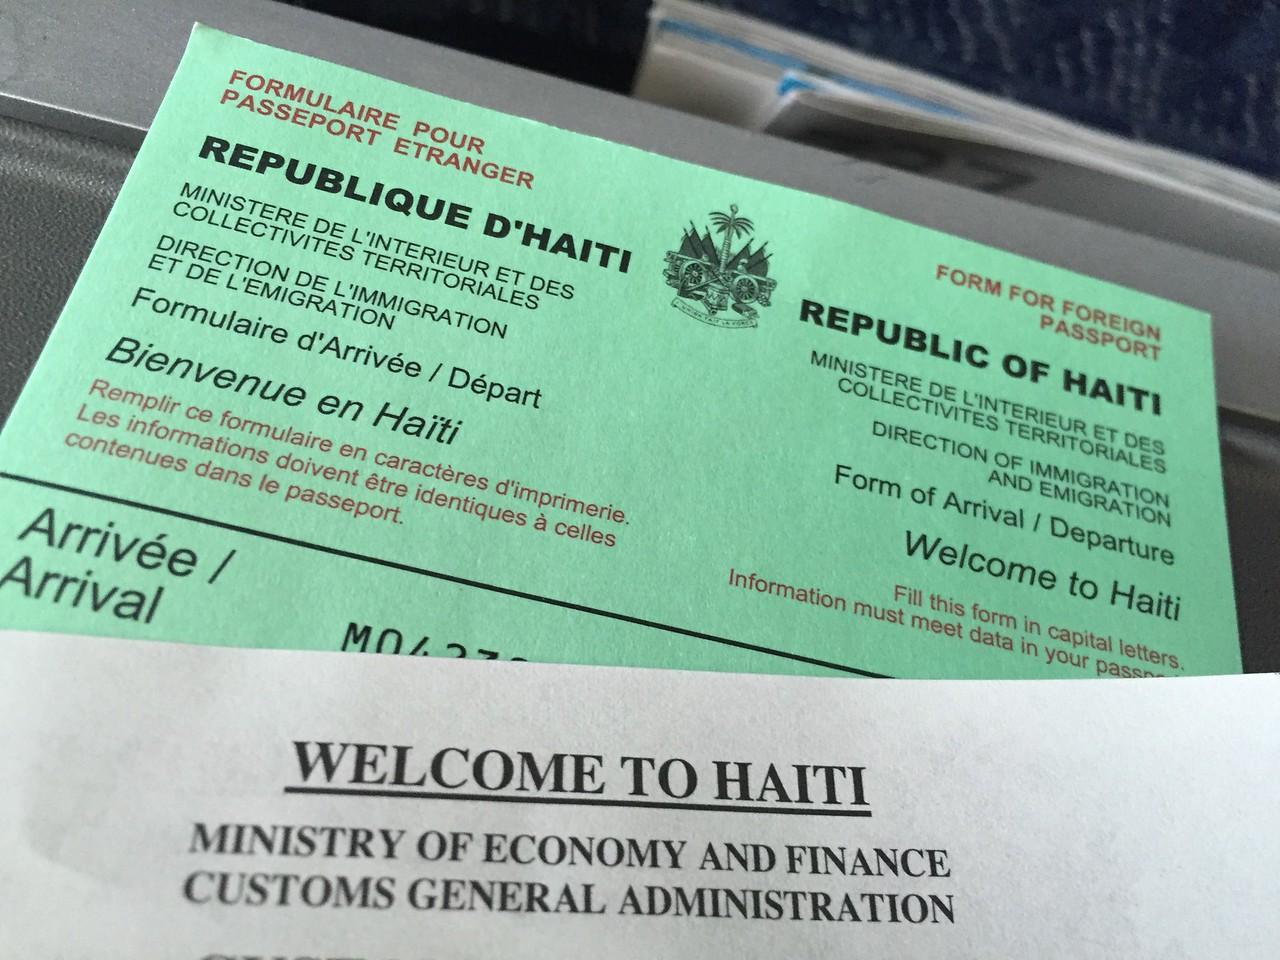 In-flight, just prior to landing in Haiti